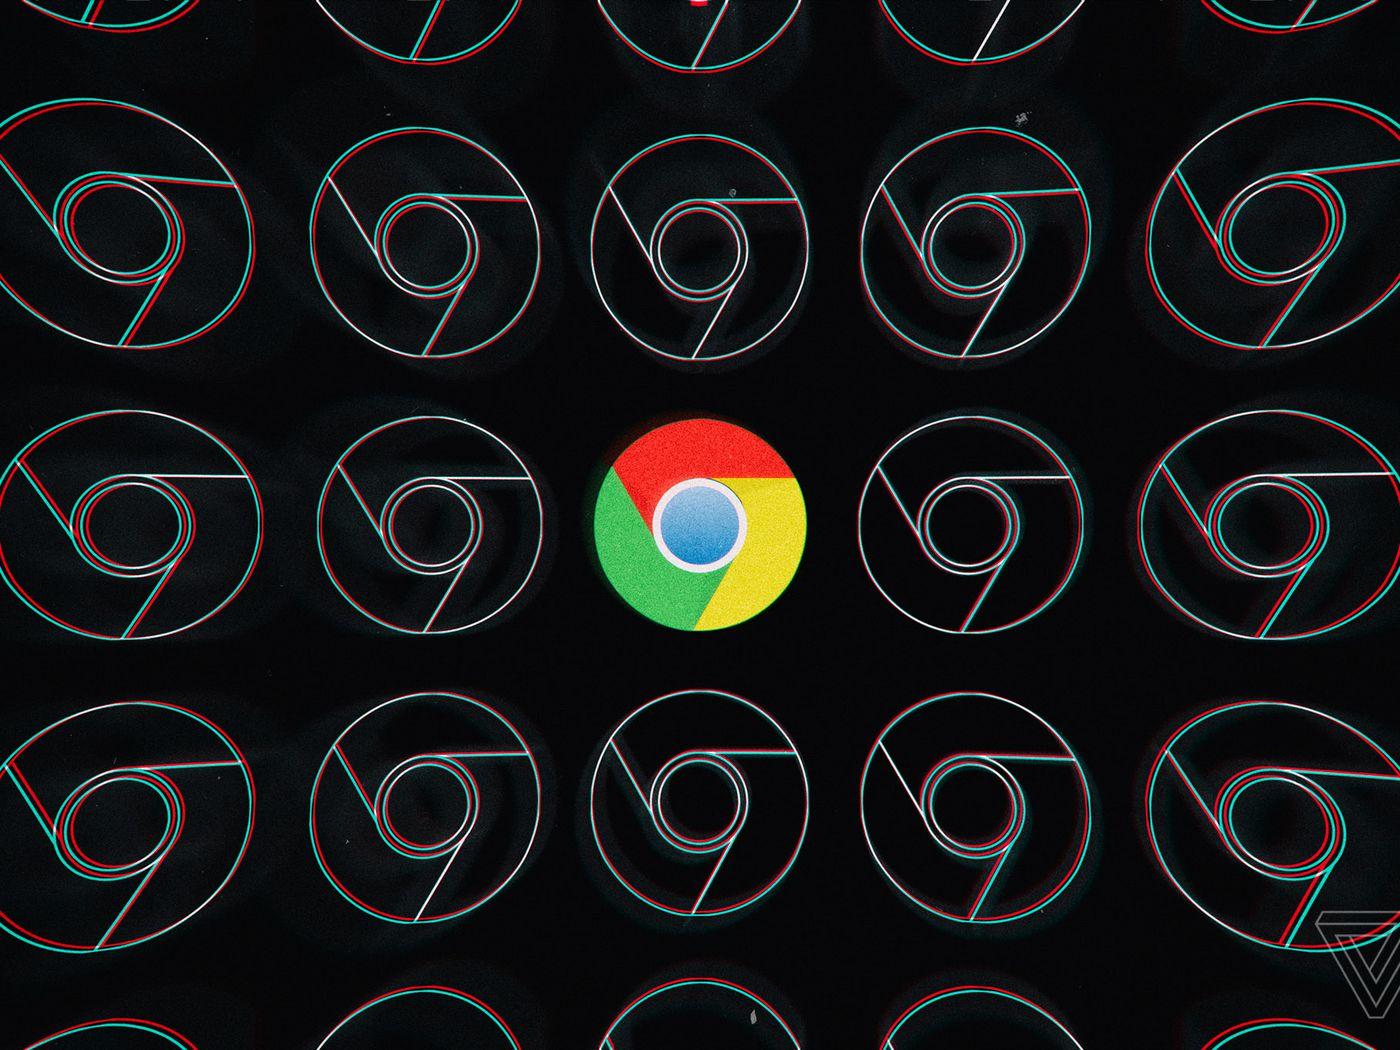 Google starts blocking annoying autoplay videos in Chrome